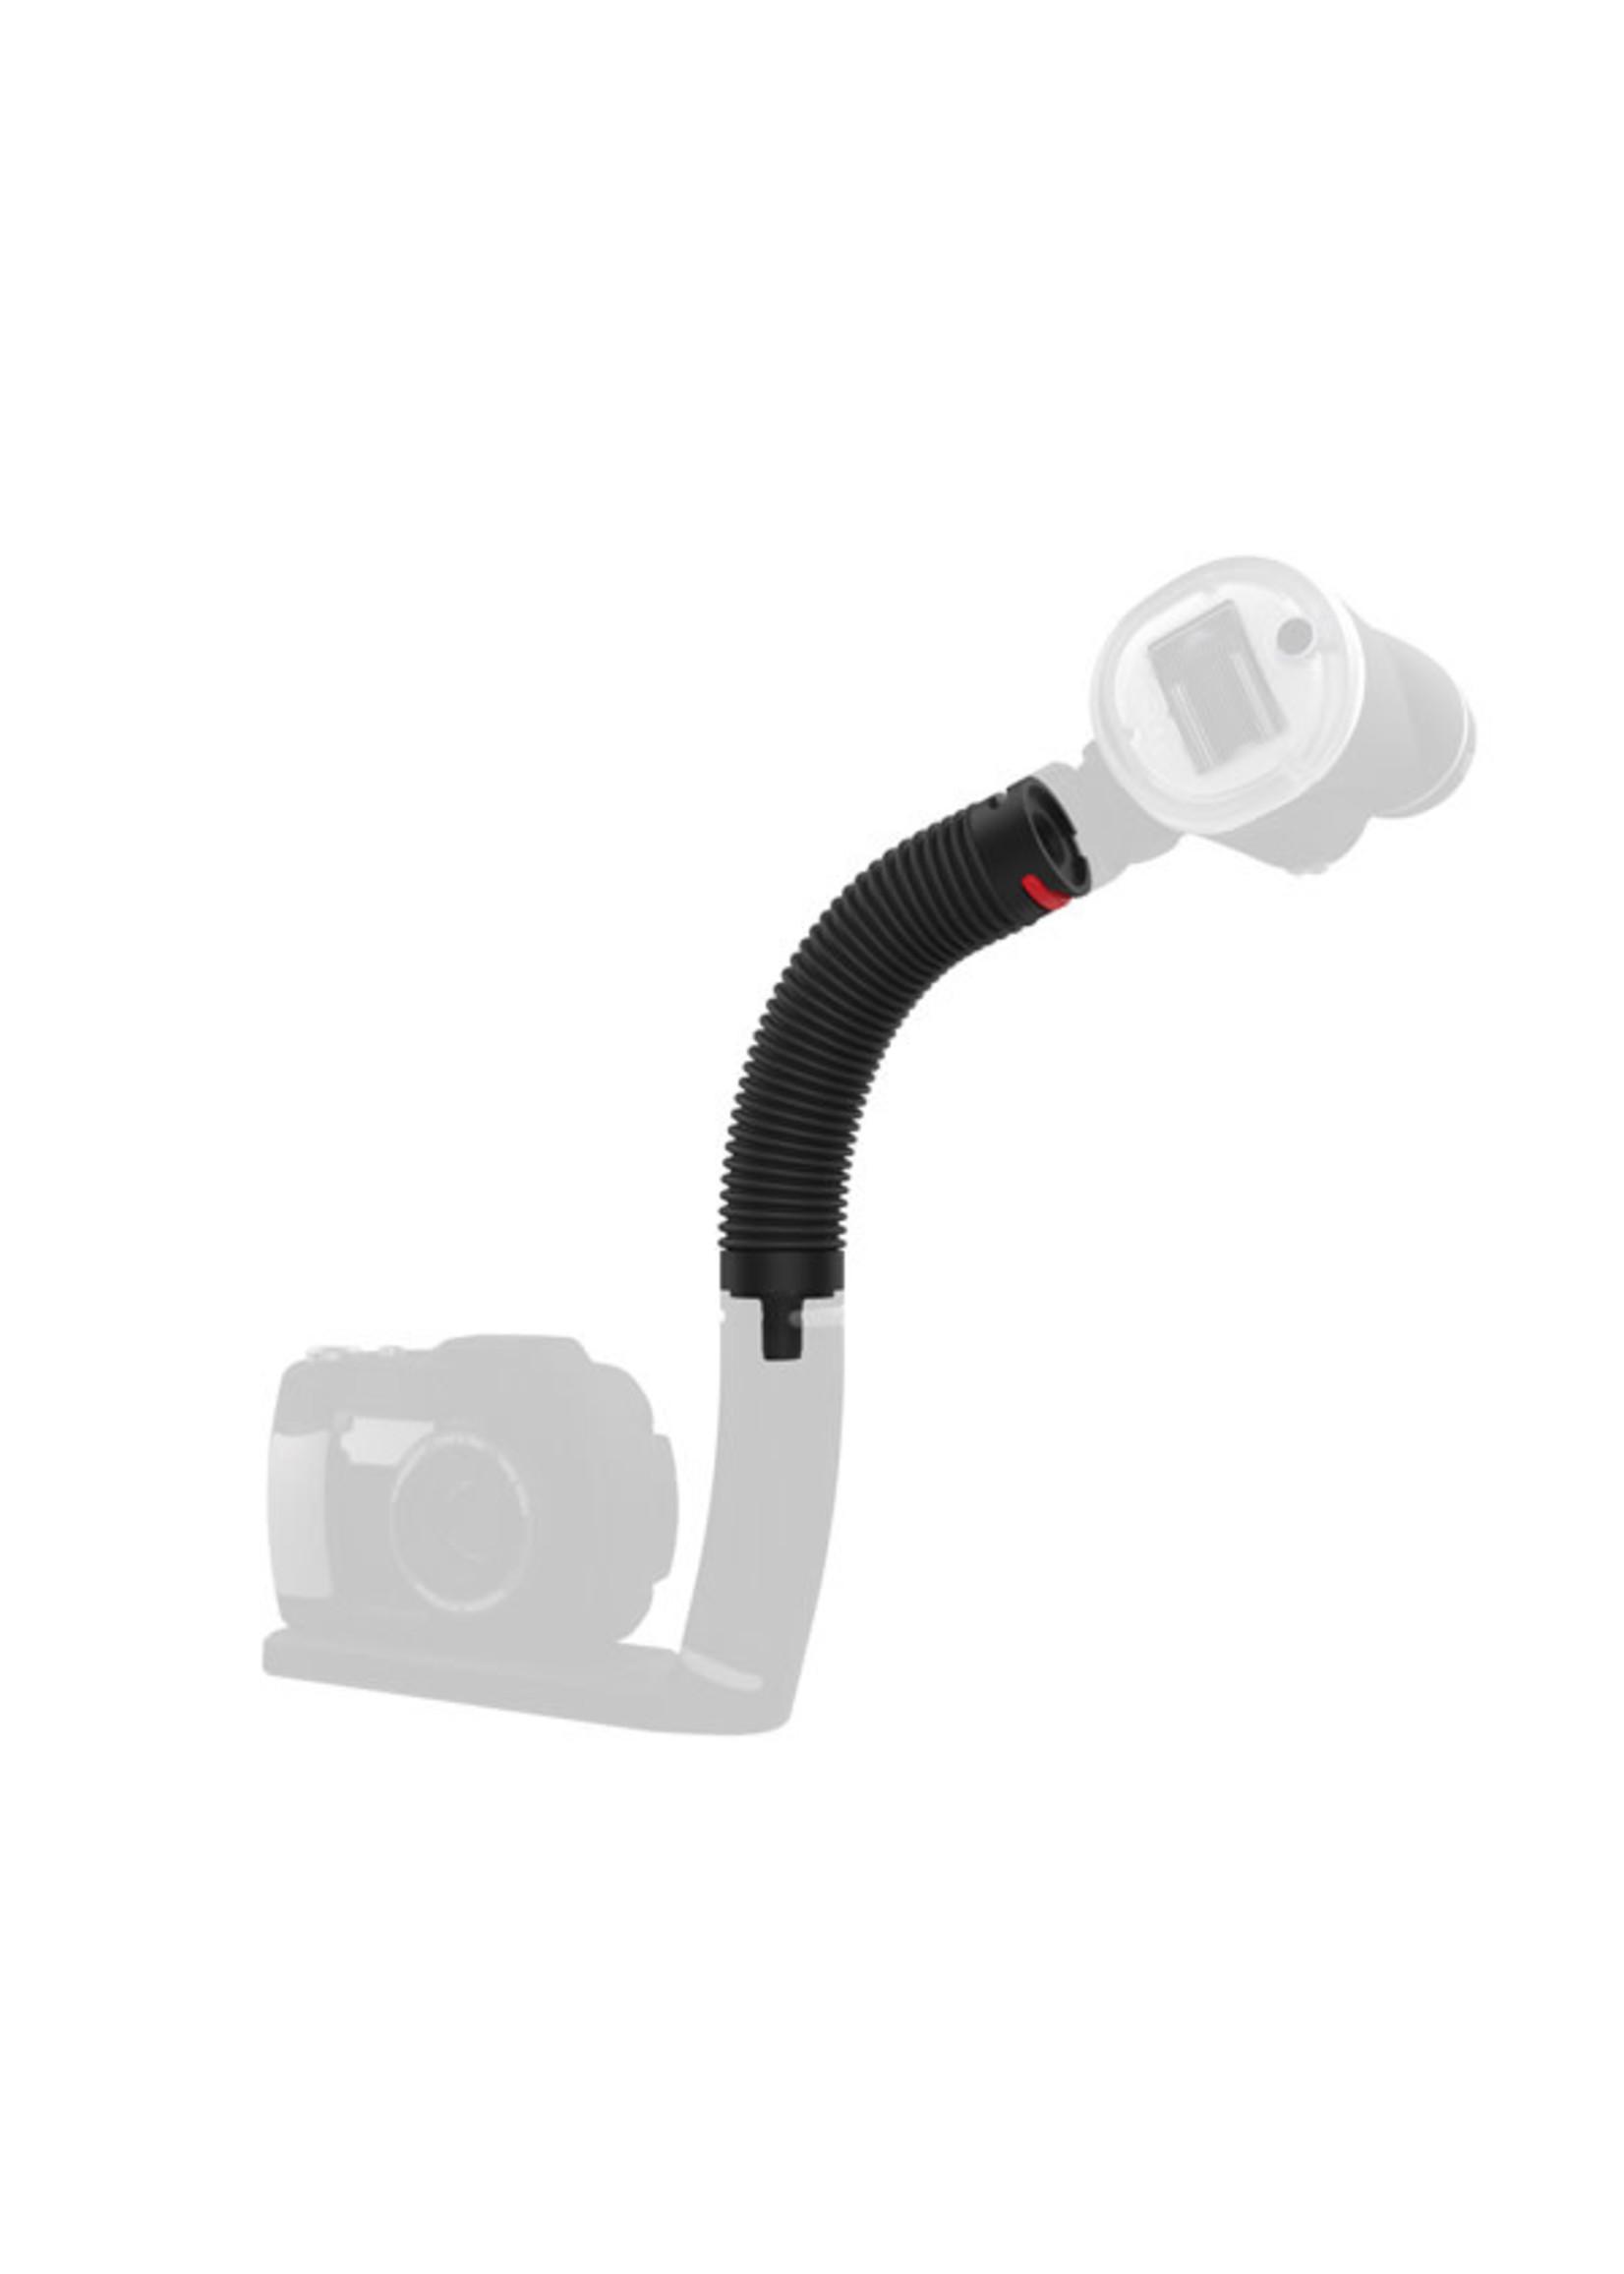 Sealife Flex-Connect Grip